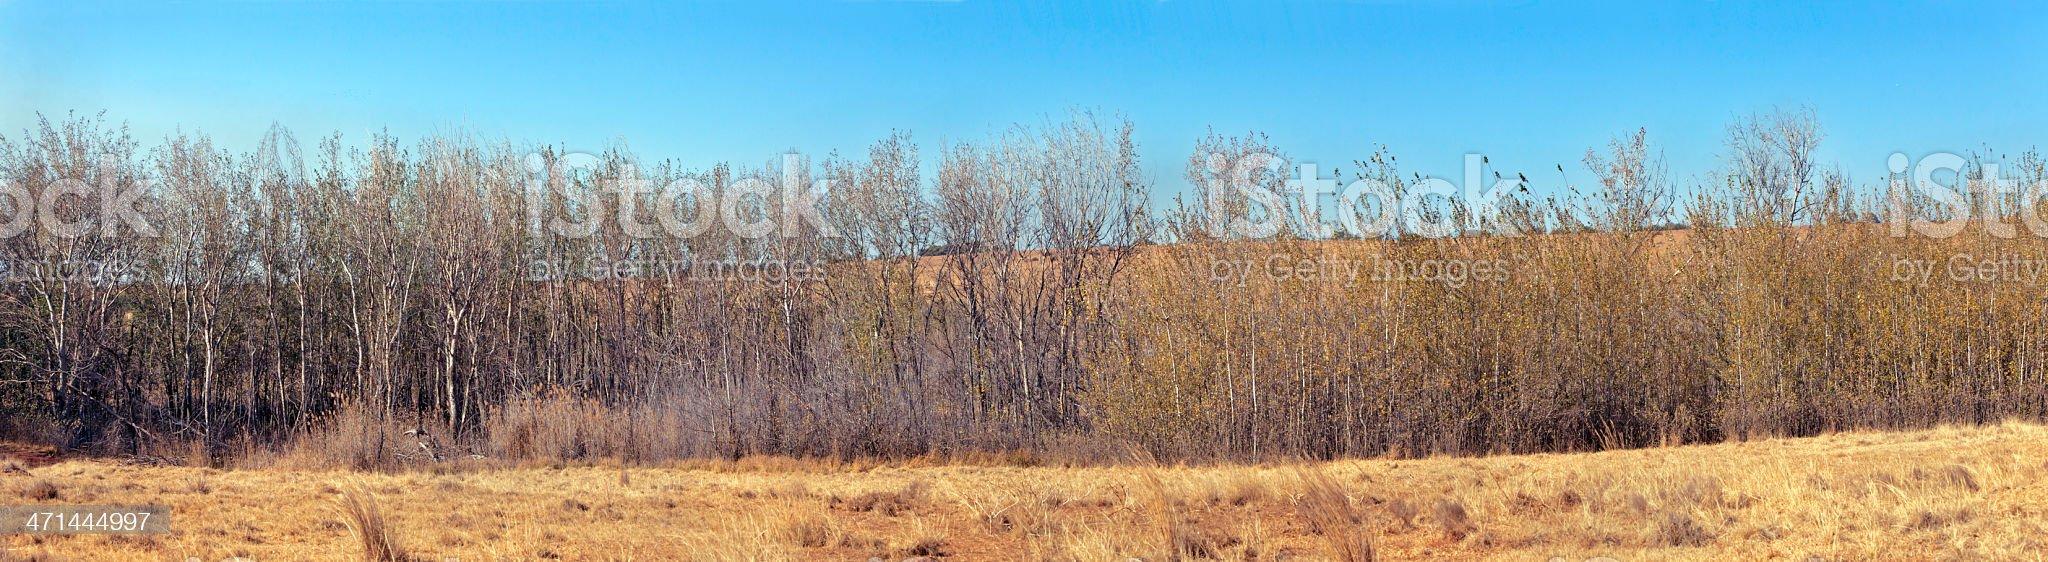 Tree Bush autumn panaroma royalty-free stock photo